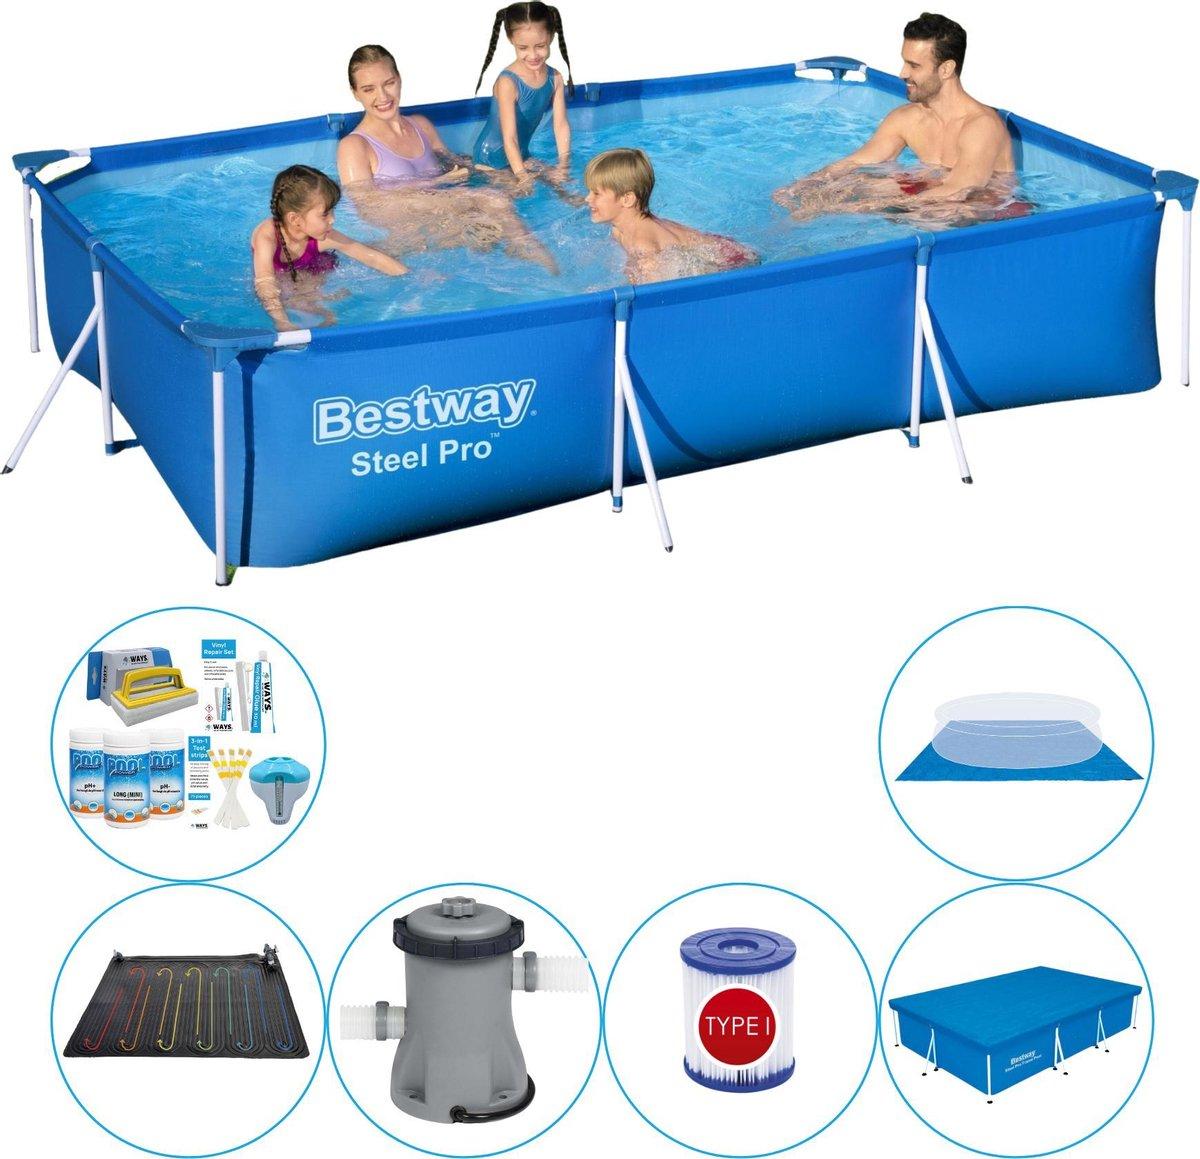 Bestway zwembad - Frame Pool - Super Deal - 300 x 200 x 66 cm - blauw